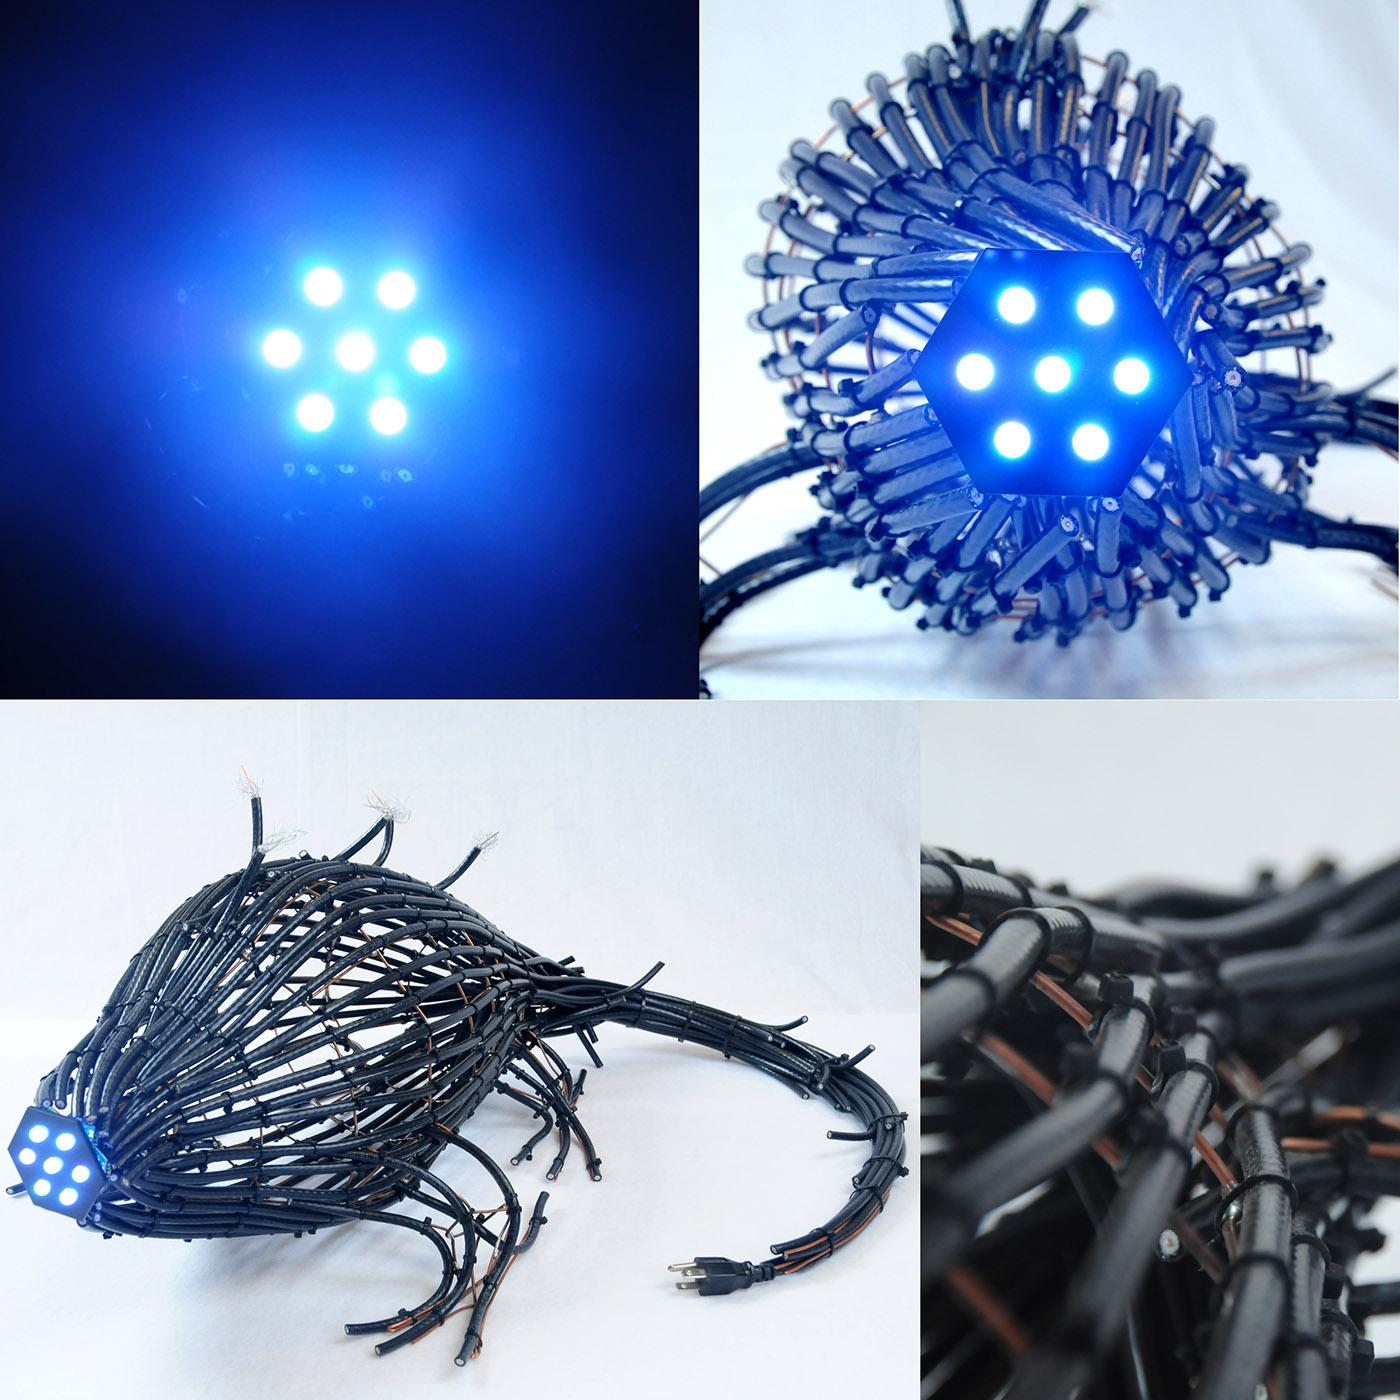 creature predator 3D sculpture